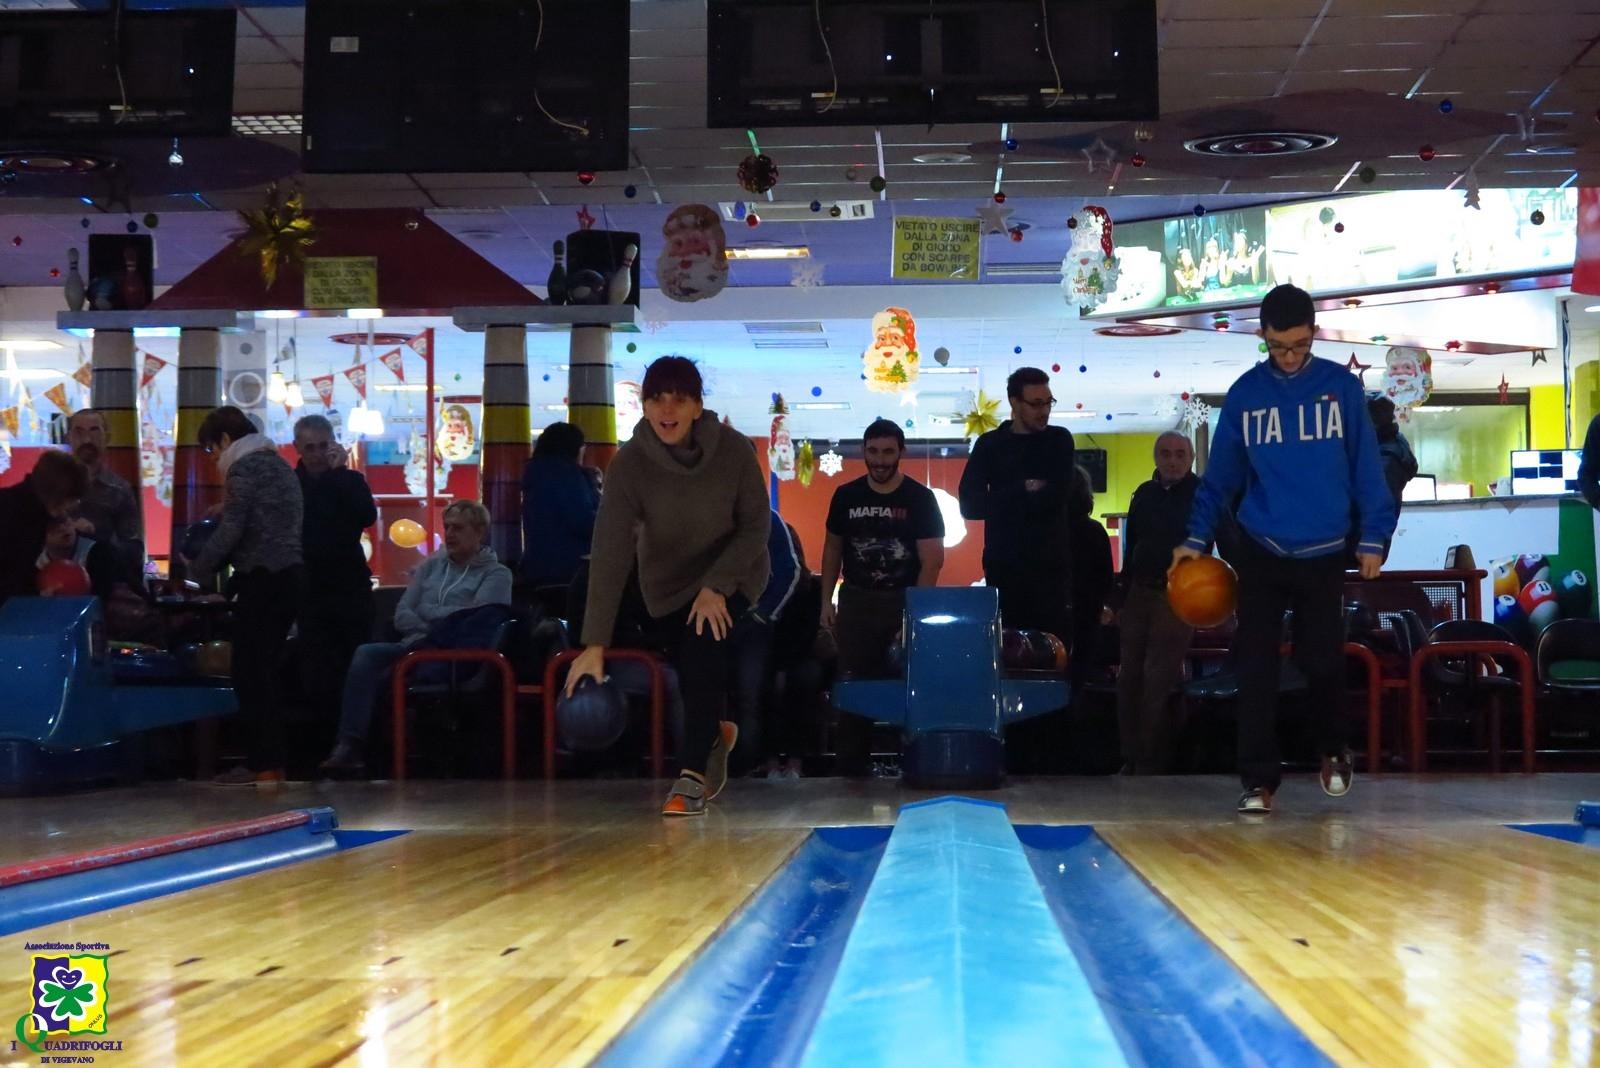 Torneo Bowling Vigevano 19-12-2018 - 021